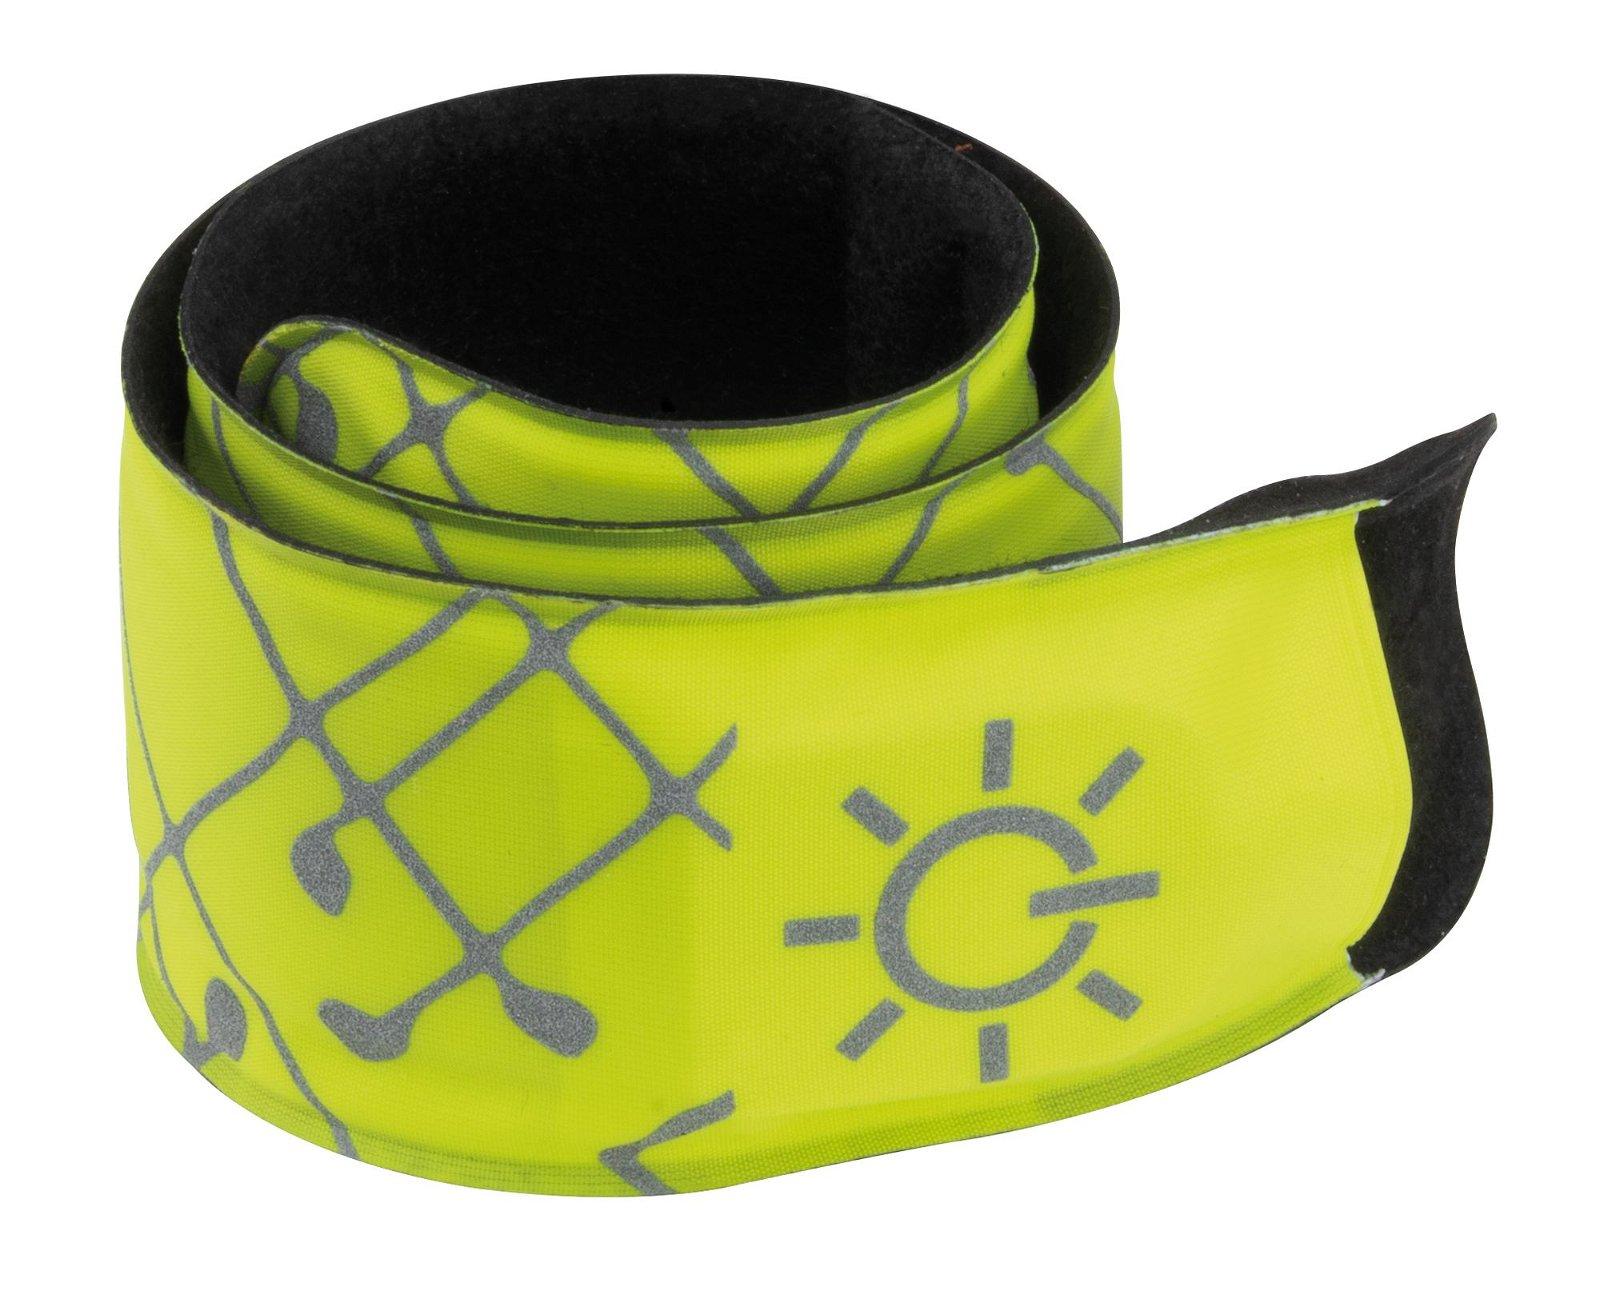 Sportlicht LED Slap Band Gelb